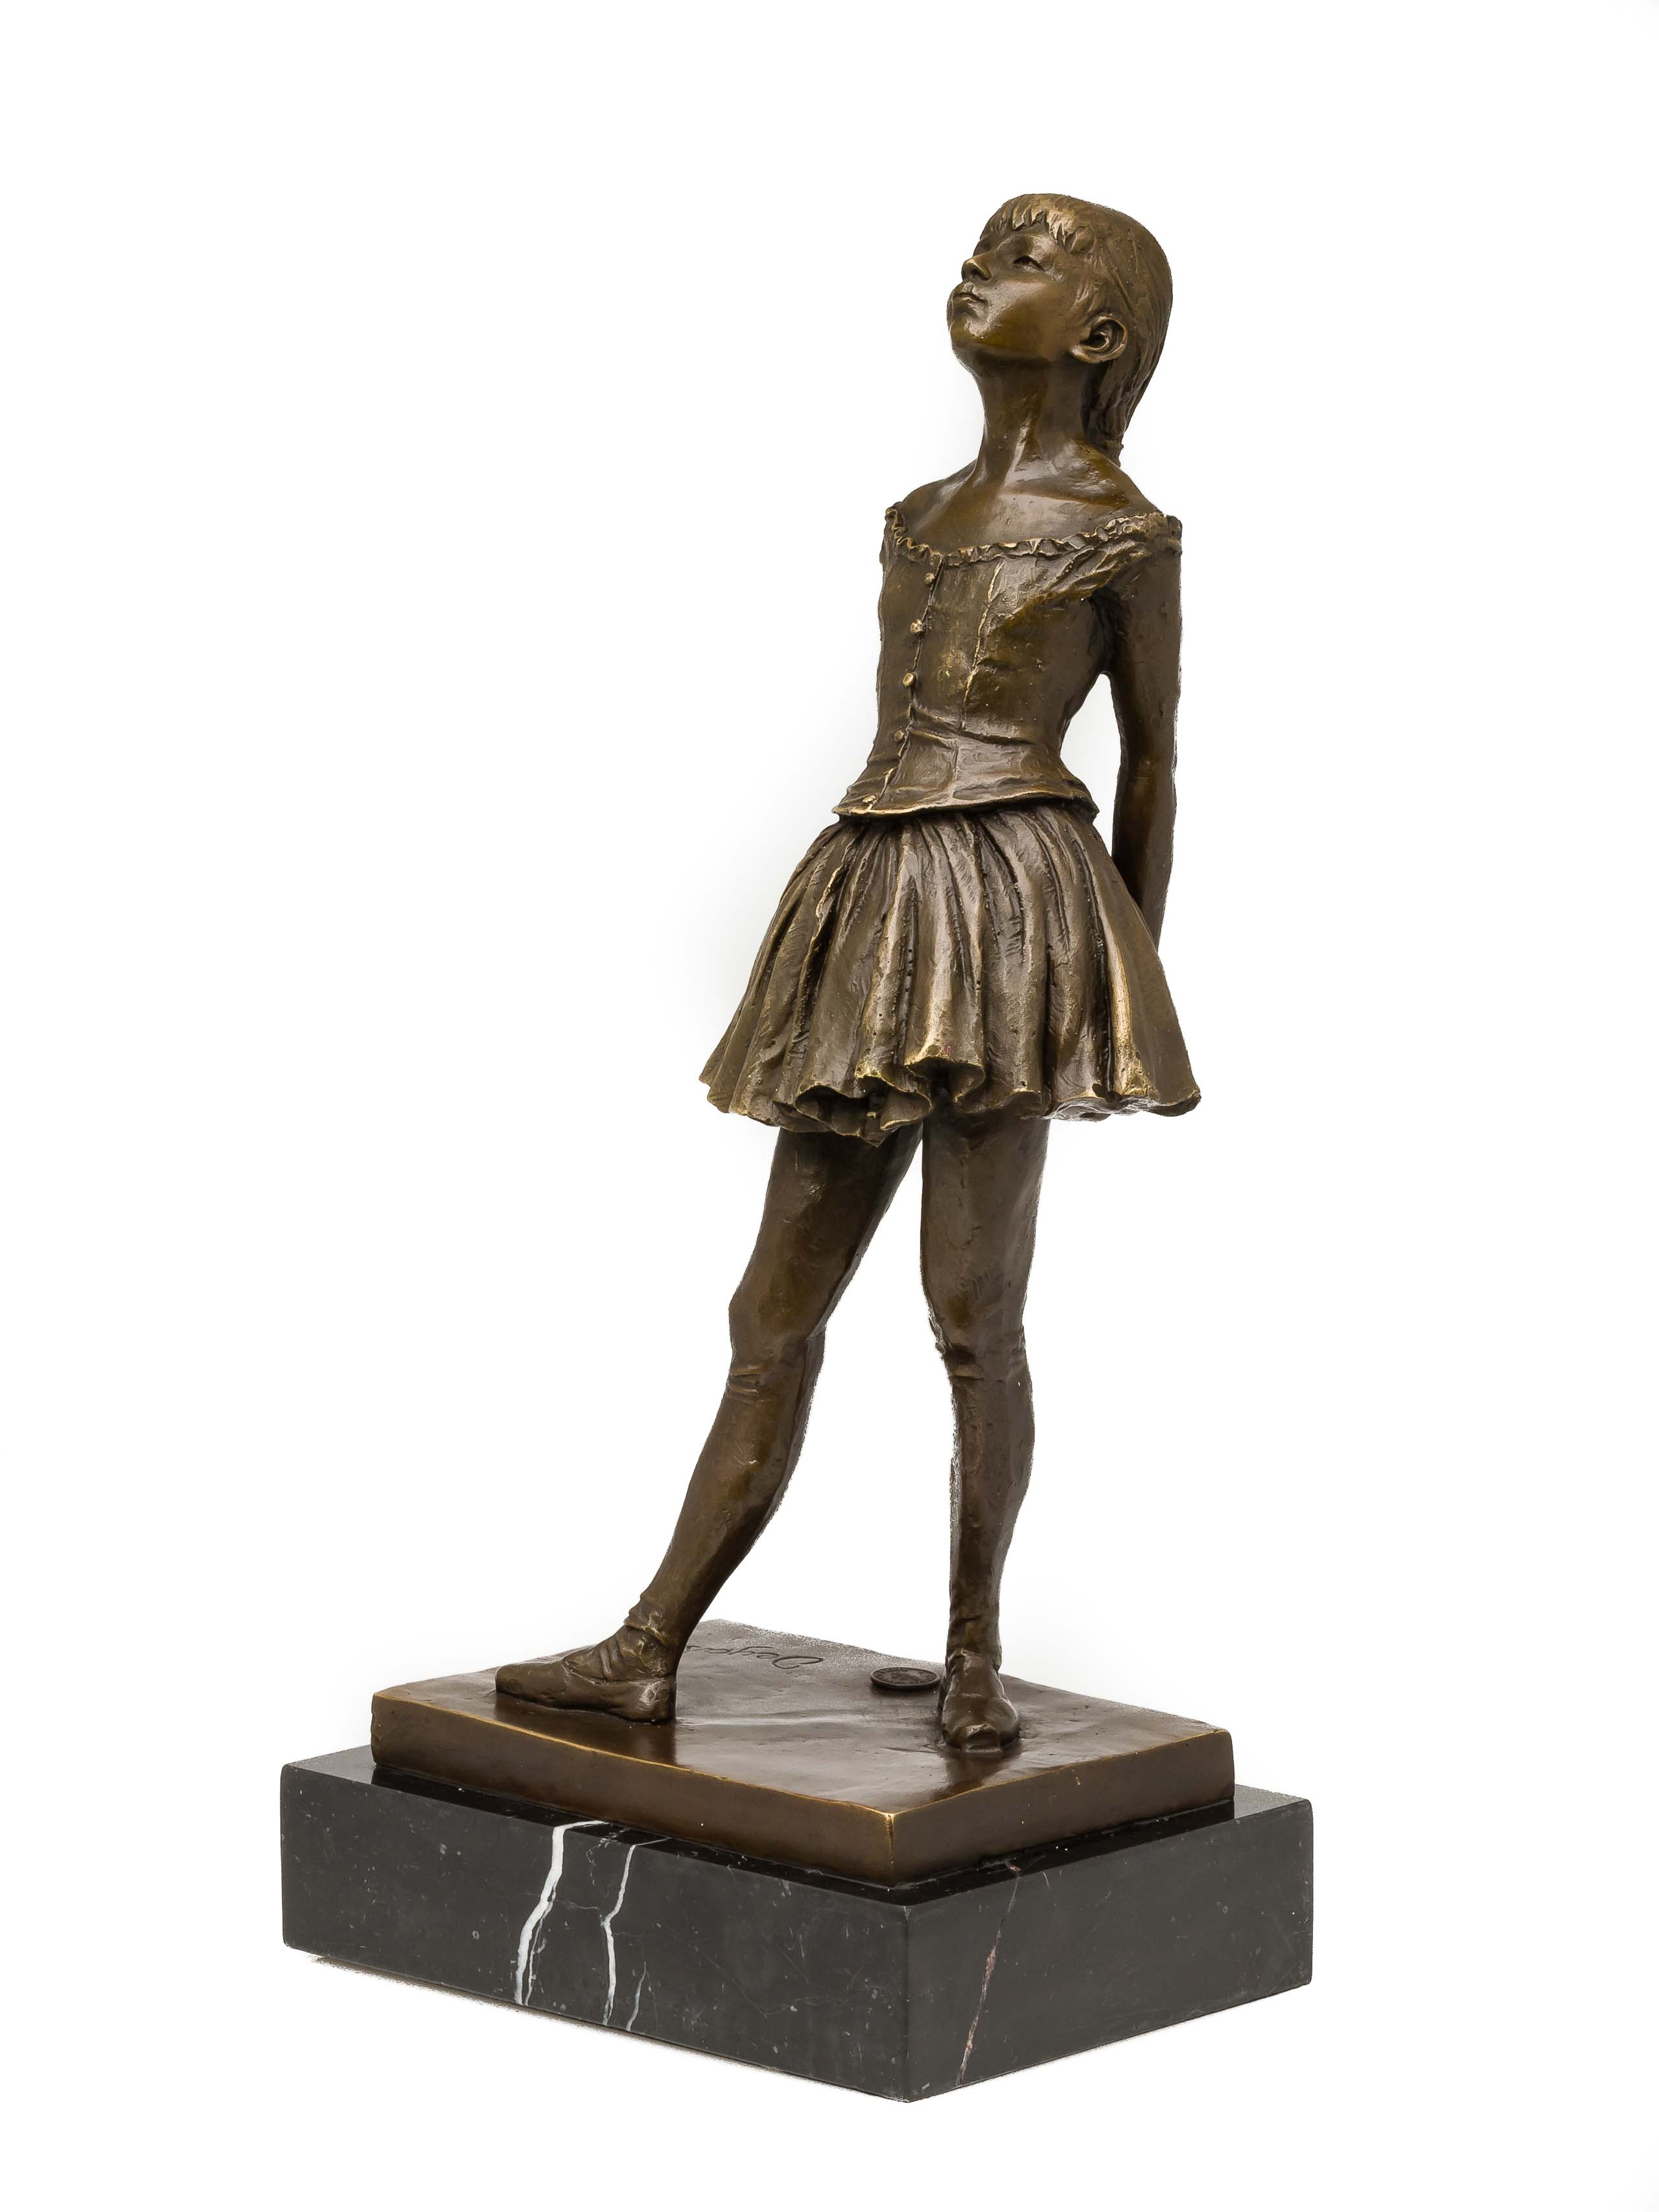 omgång Mer solidaritet  Bronze sculpture, dancer, ballerina, ballet, bronze figure, sculpture,  antique | aubaho ®